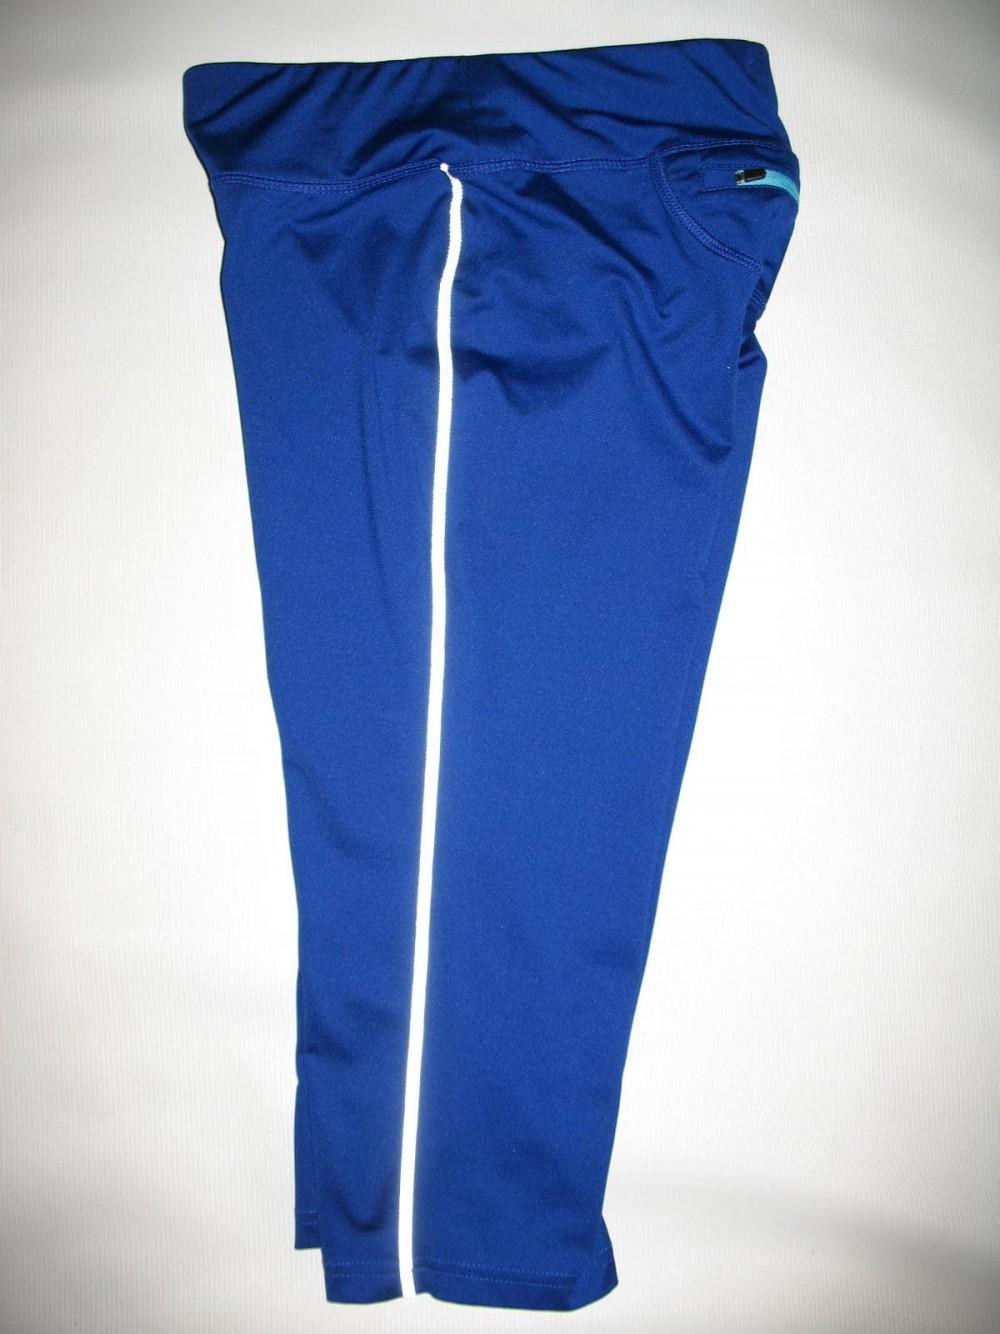 Шорты CRIVIT 3/4 shorts lady (размер S/М(38-40)) - 2